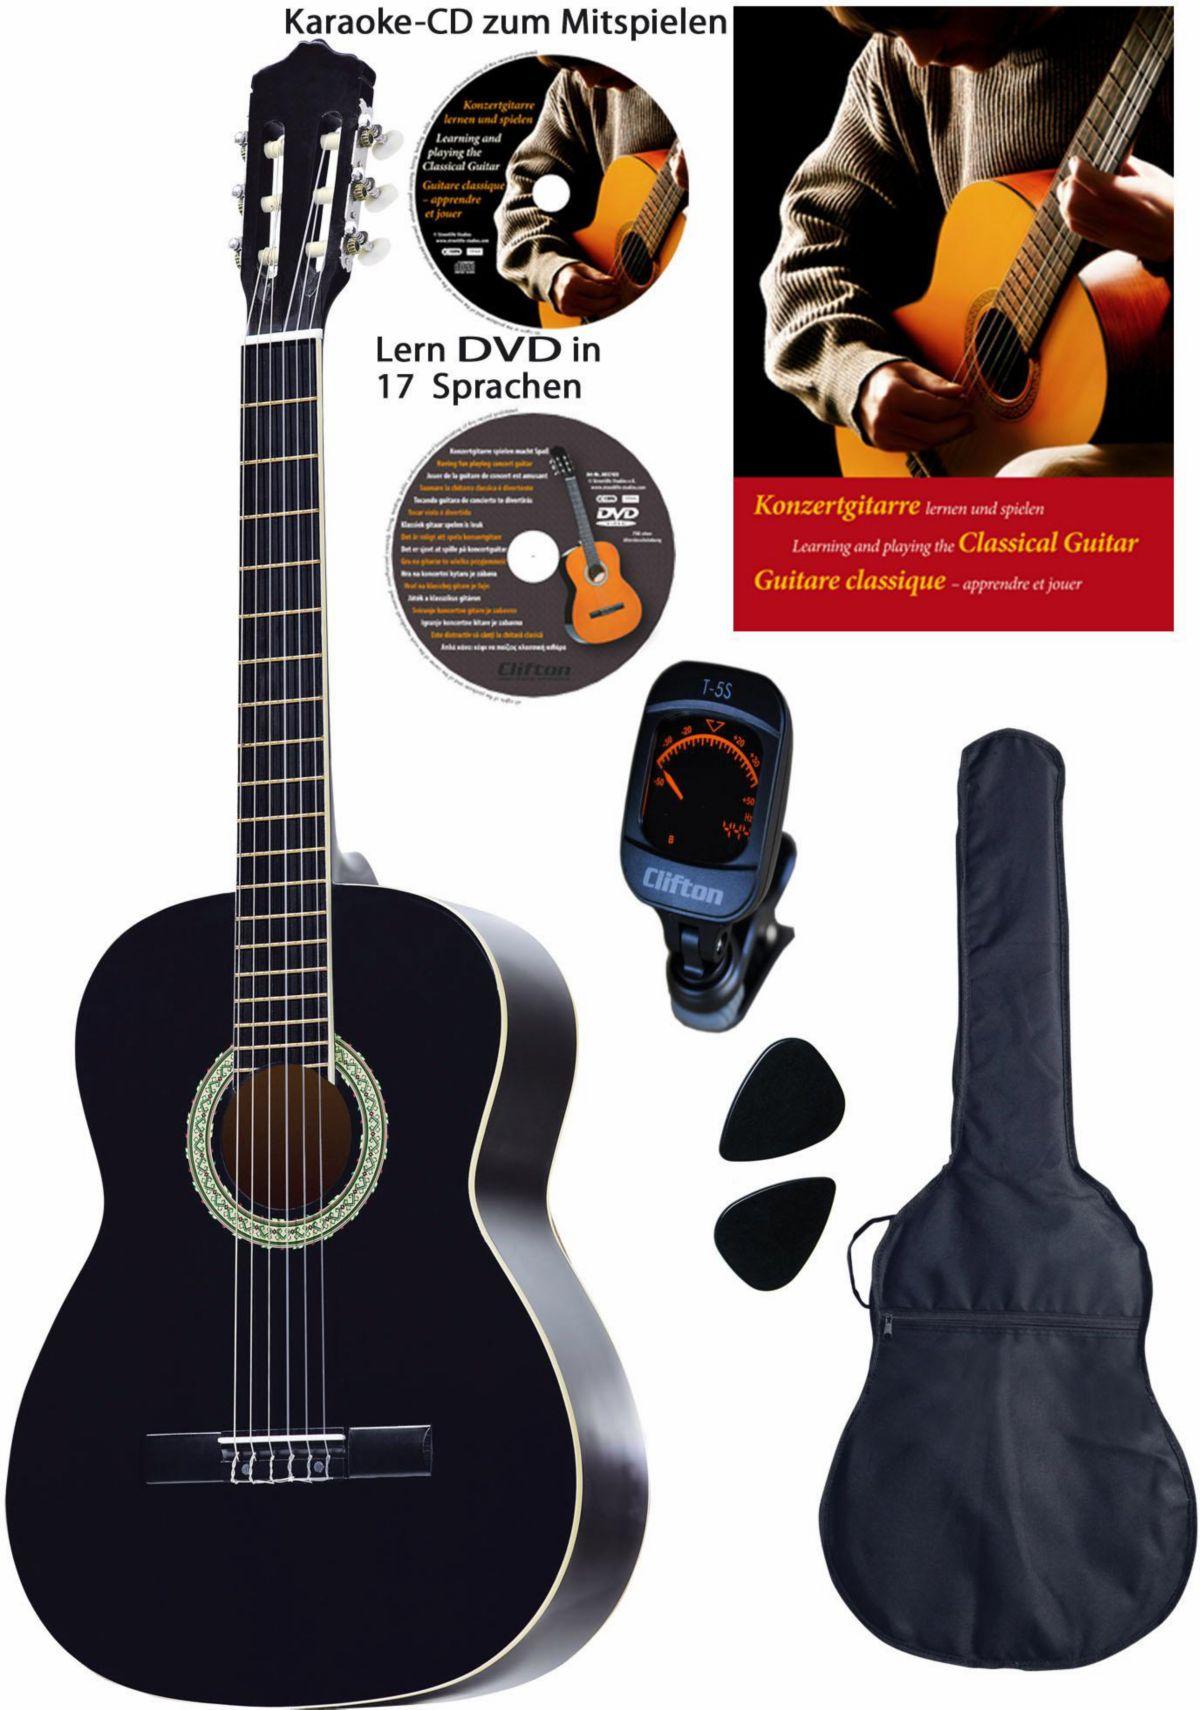 Clifton Gitarrenkomplettset Konzertgitarren Set 4 4